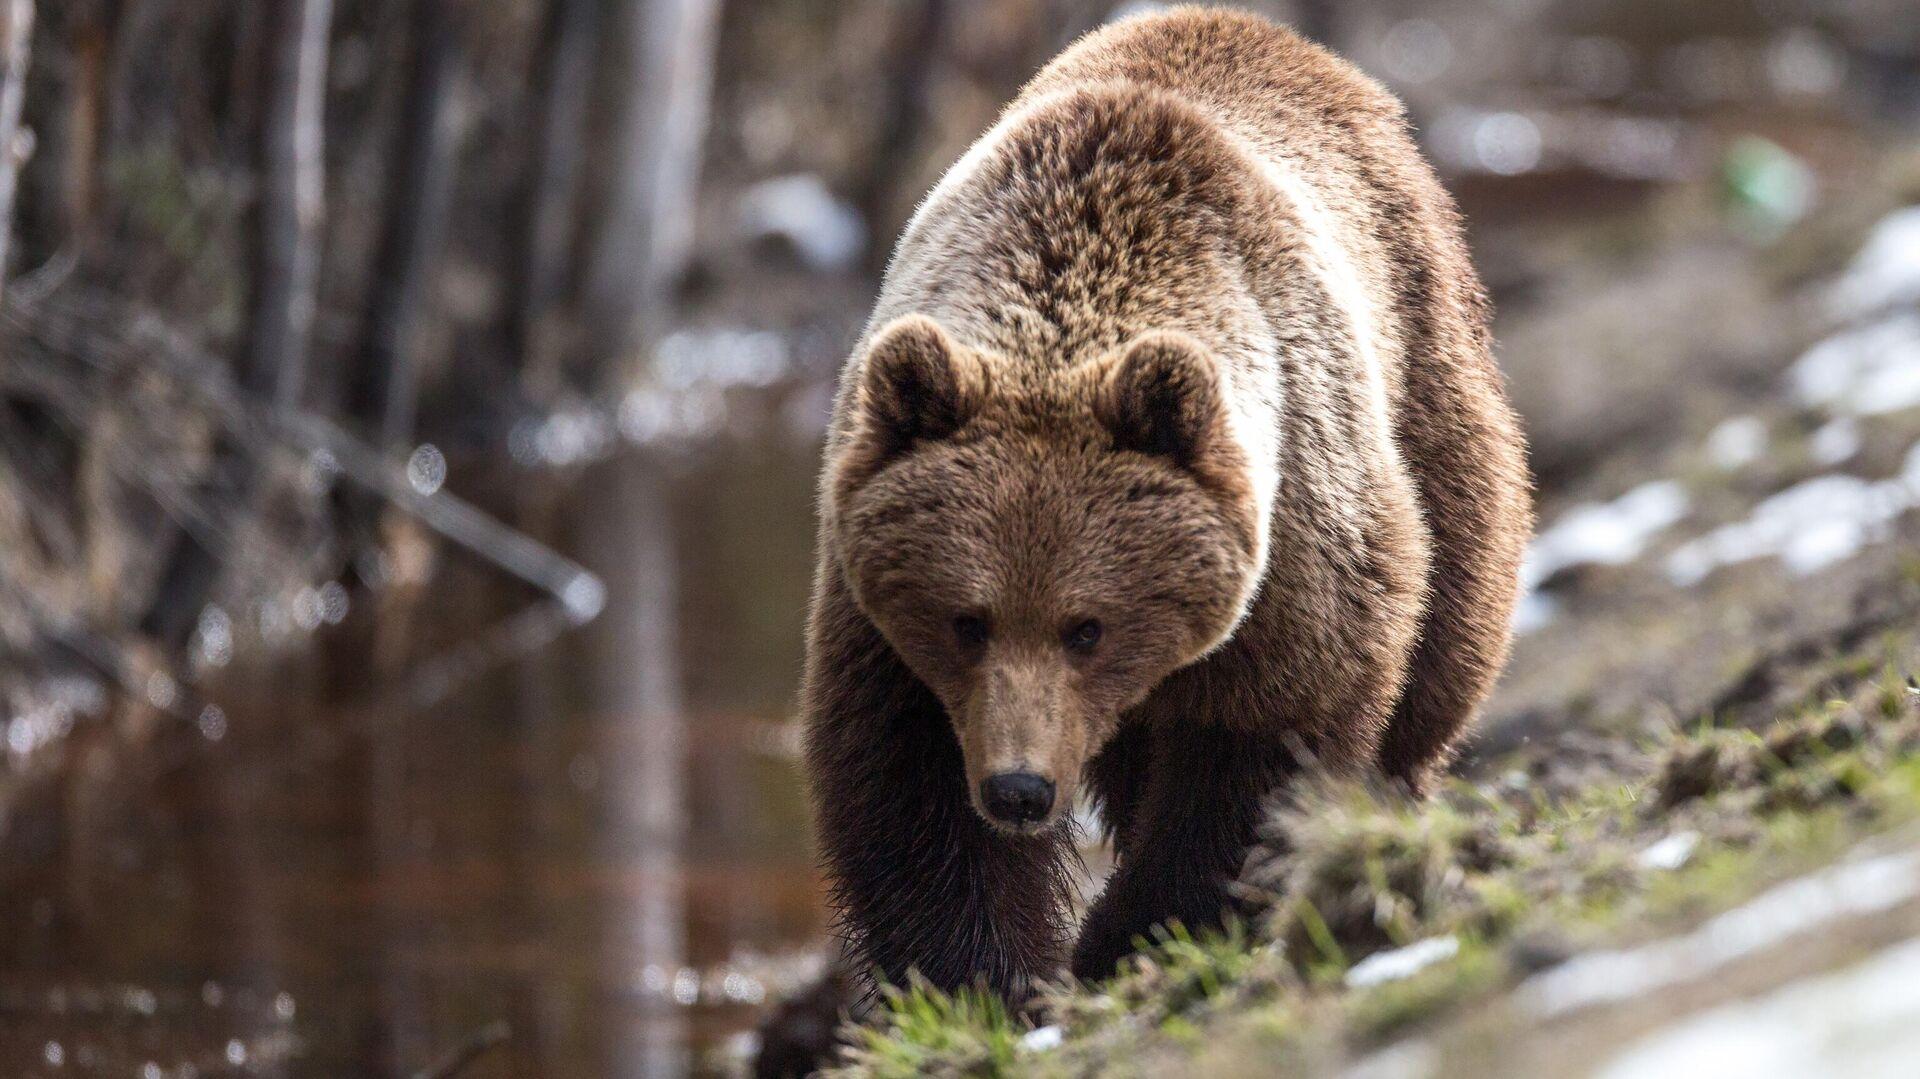 Bär im Nationalpark Jergaki, Region Krasnojarsk - SNA, 1920, 09.07.2021